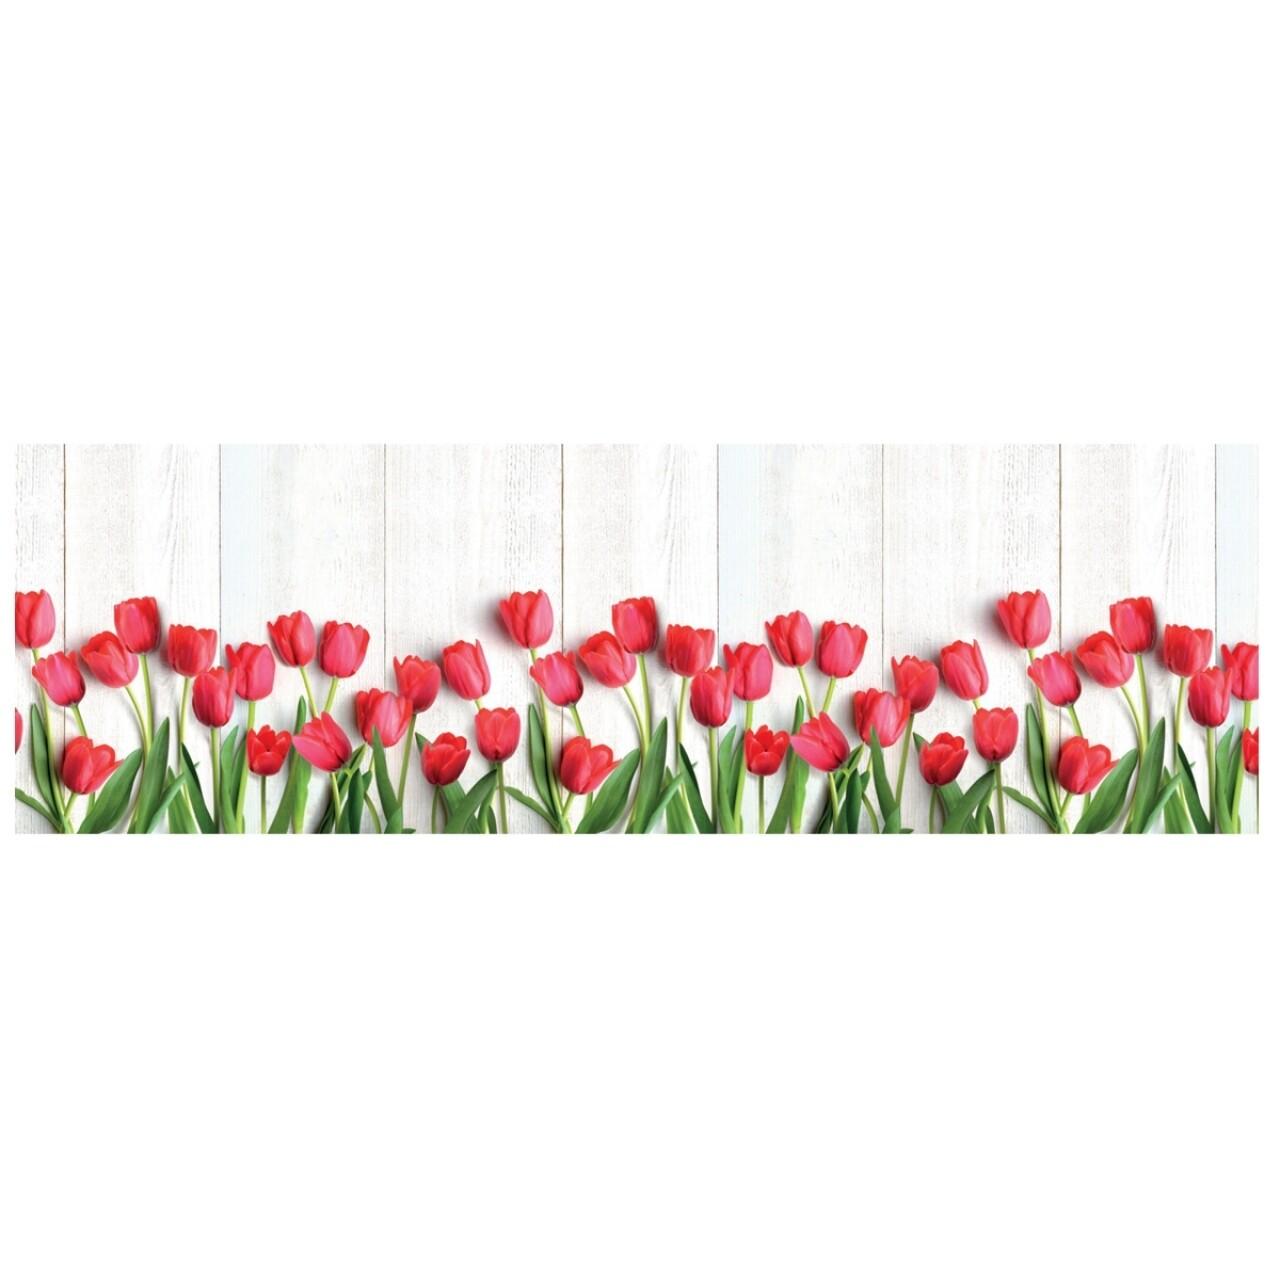 Covor rezistent Webtappeti Tulipani 58 x 115 cm, alb/verde/rosu